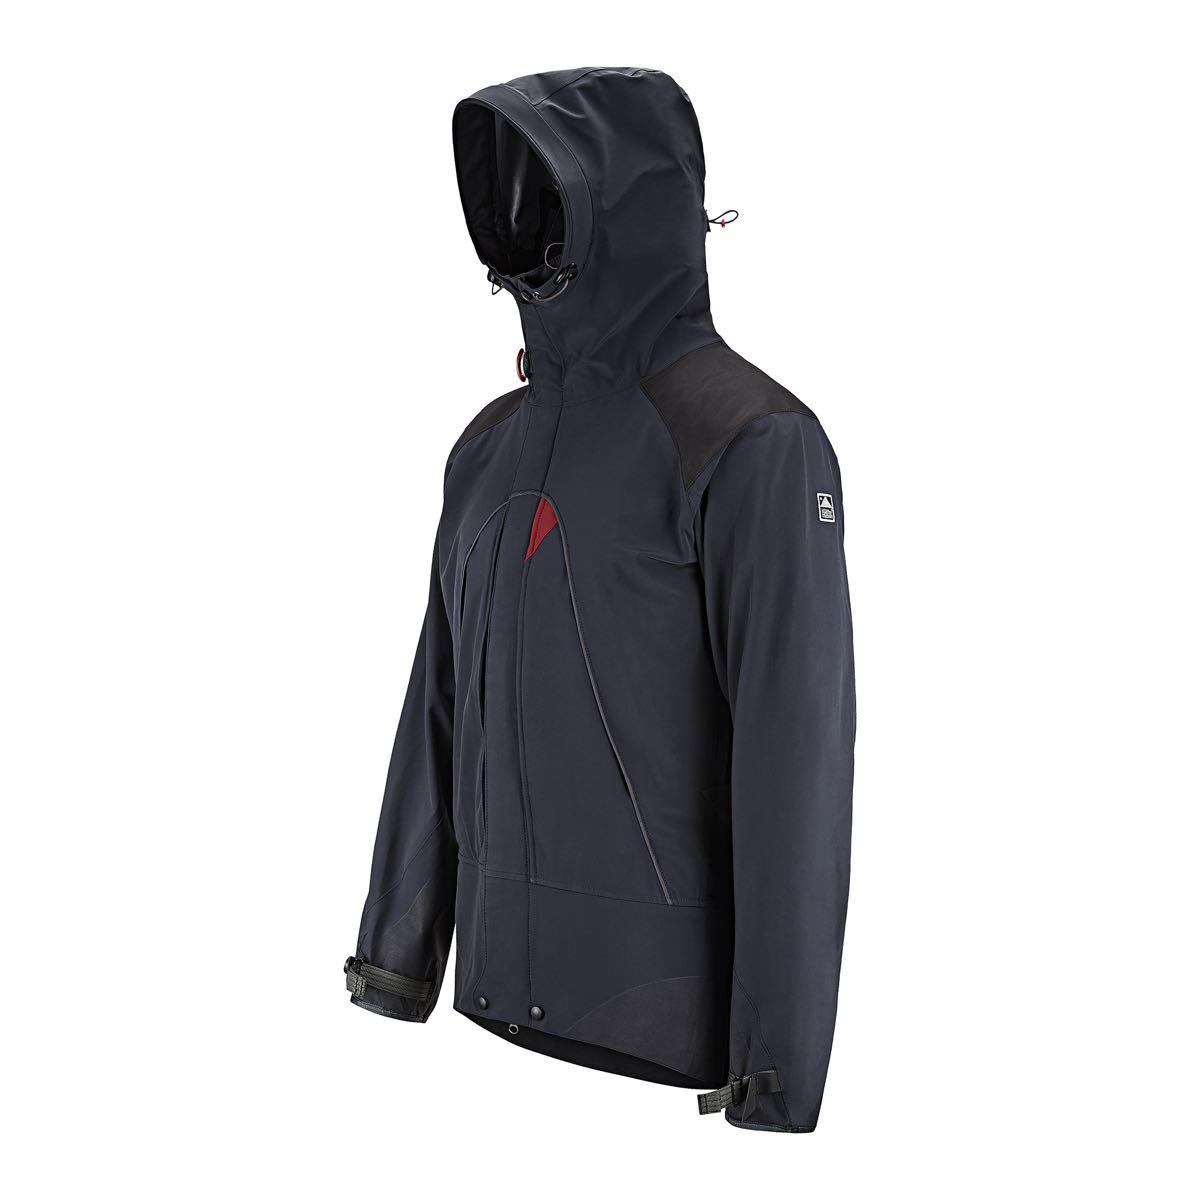 b737a02e Klättermusen Men's Brede Jacket Ebony | Fjellsport.no